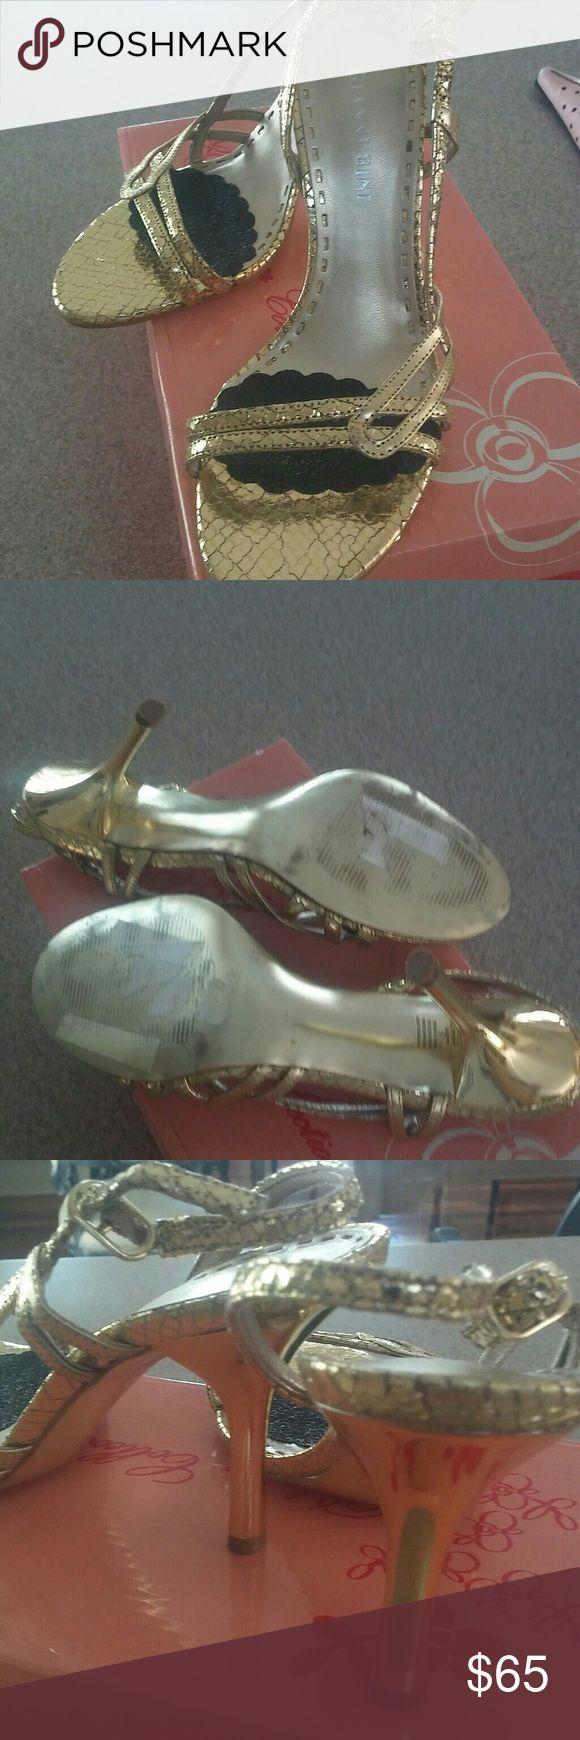 Gianni Bini gold sandals Gold Gianni Bini sandals suze 6 worn once great condition Gianni Bini Shoes